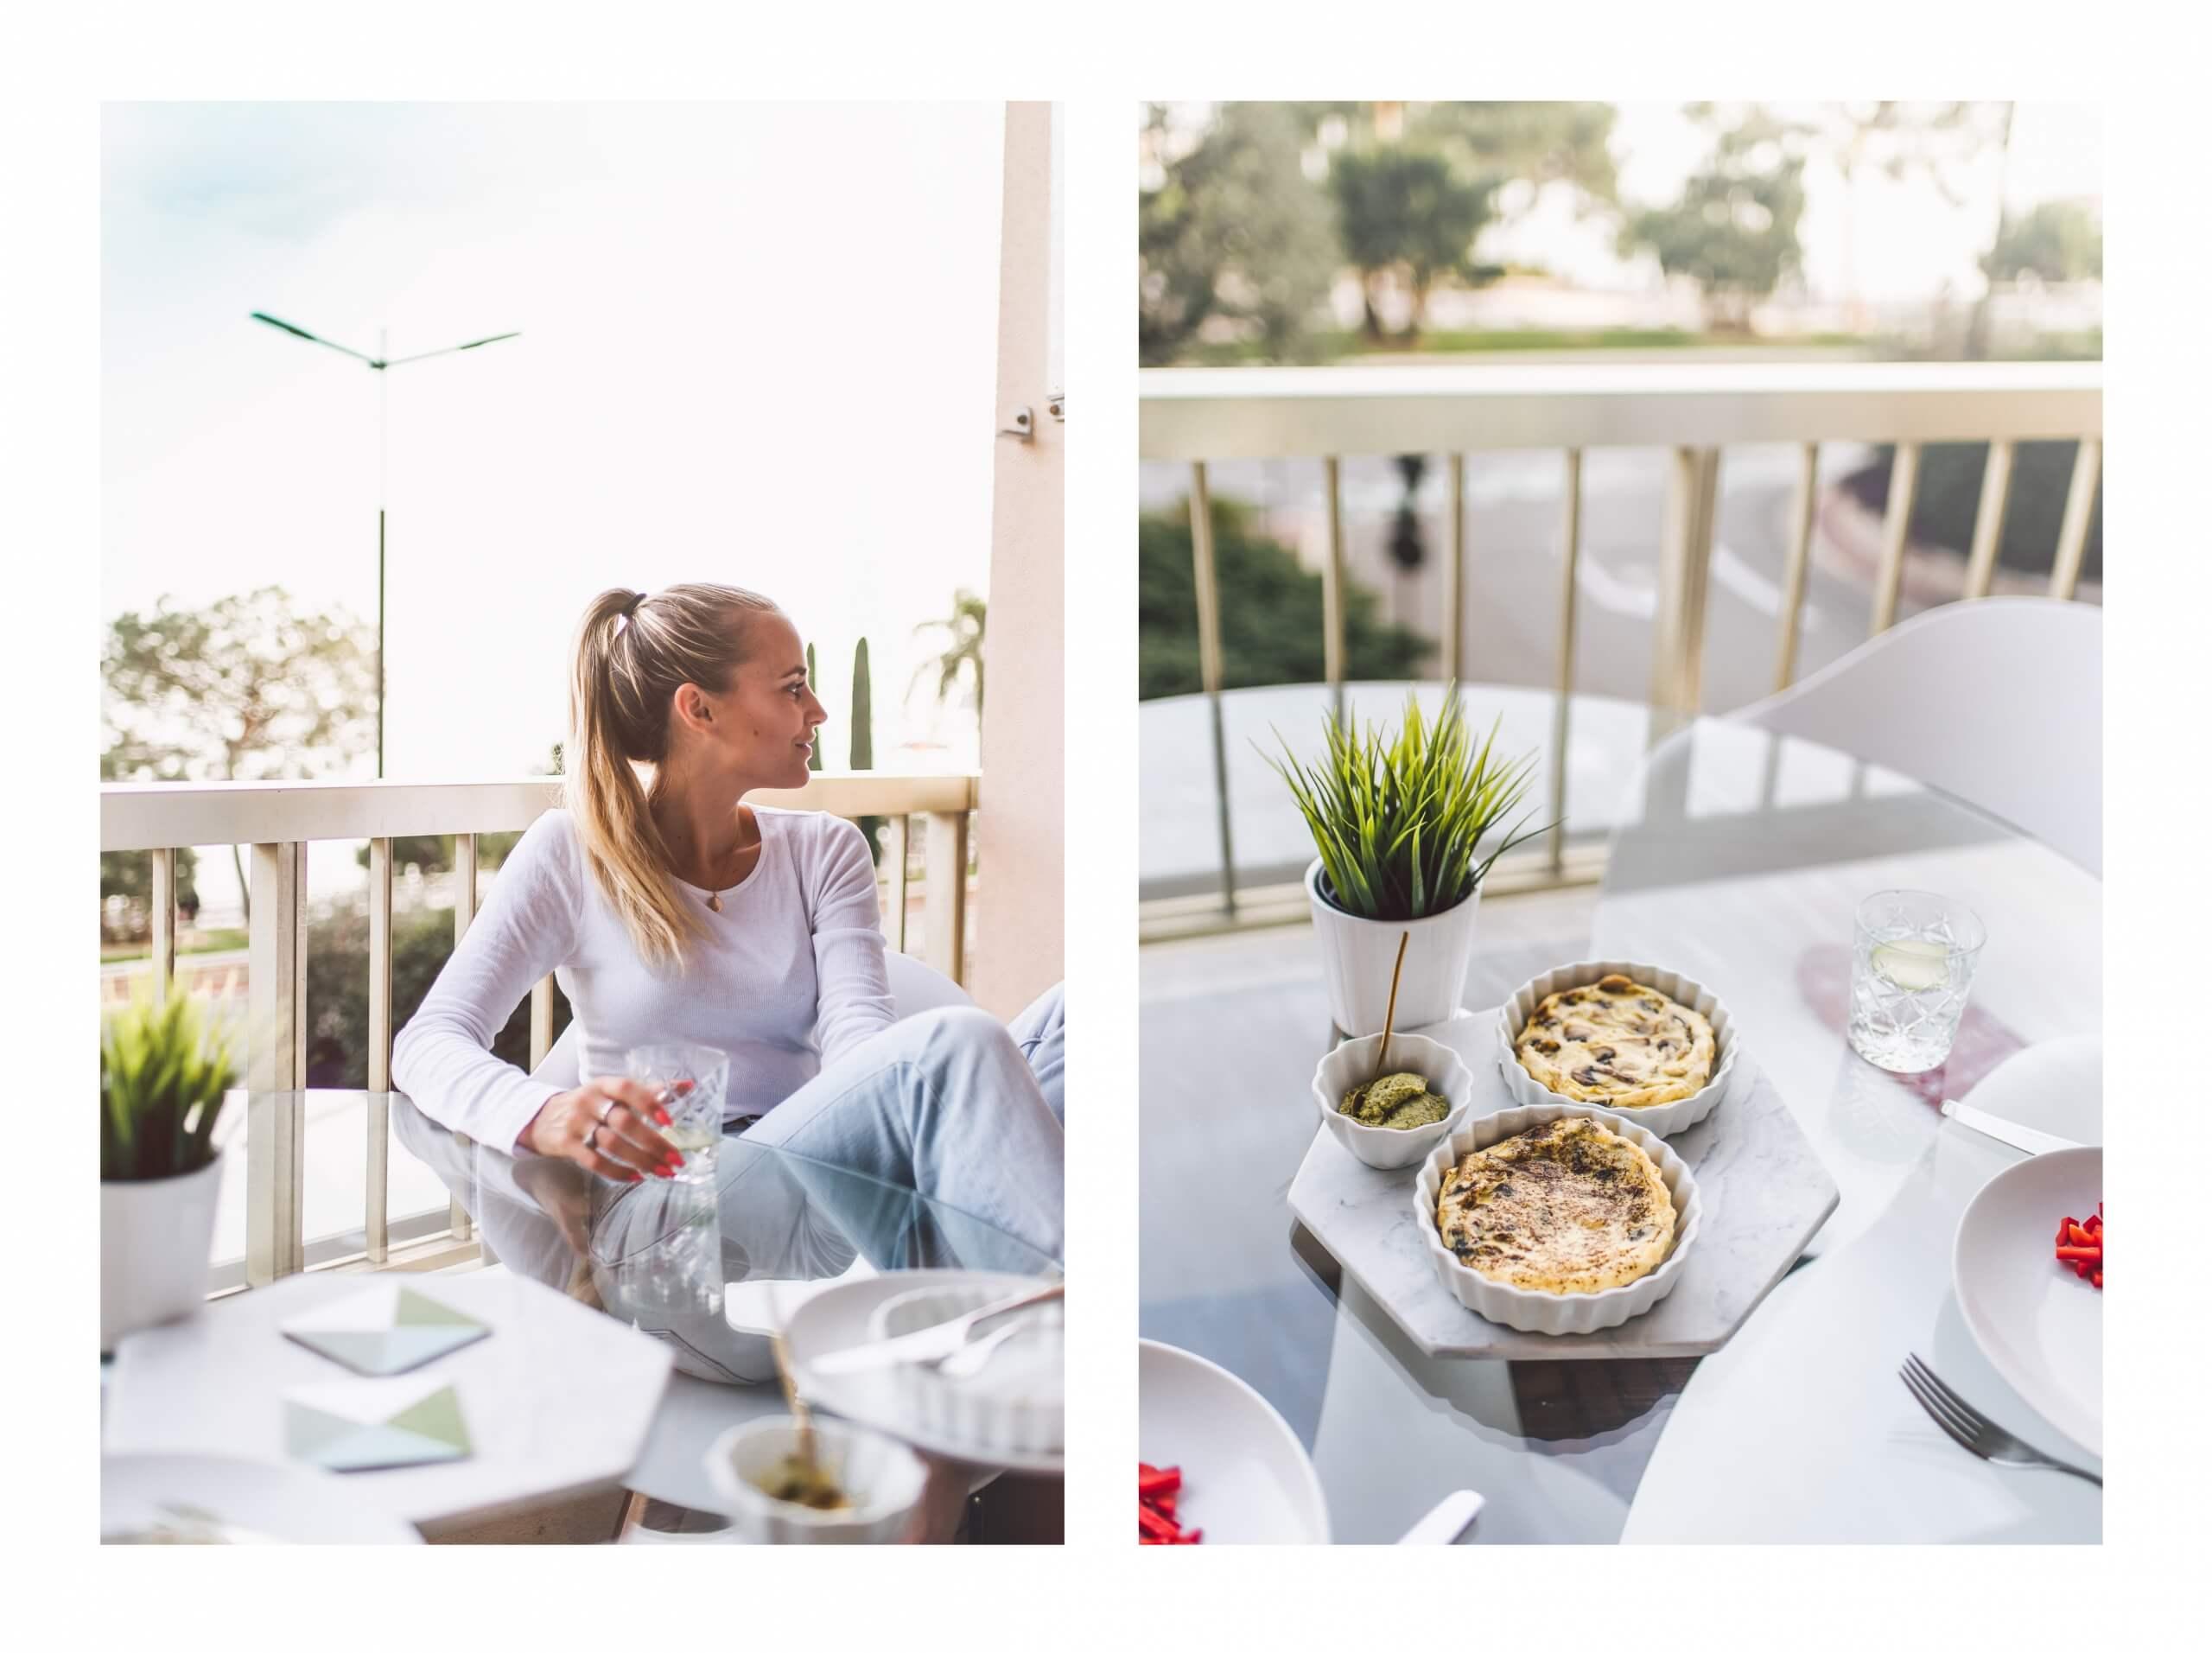 janni-deler-balcony-dinnerDSC_2541 copy